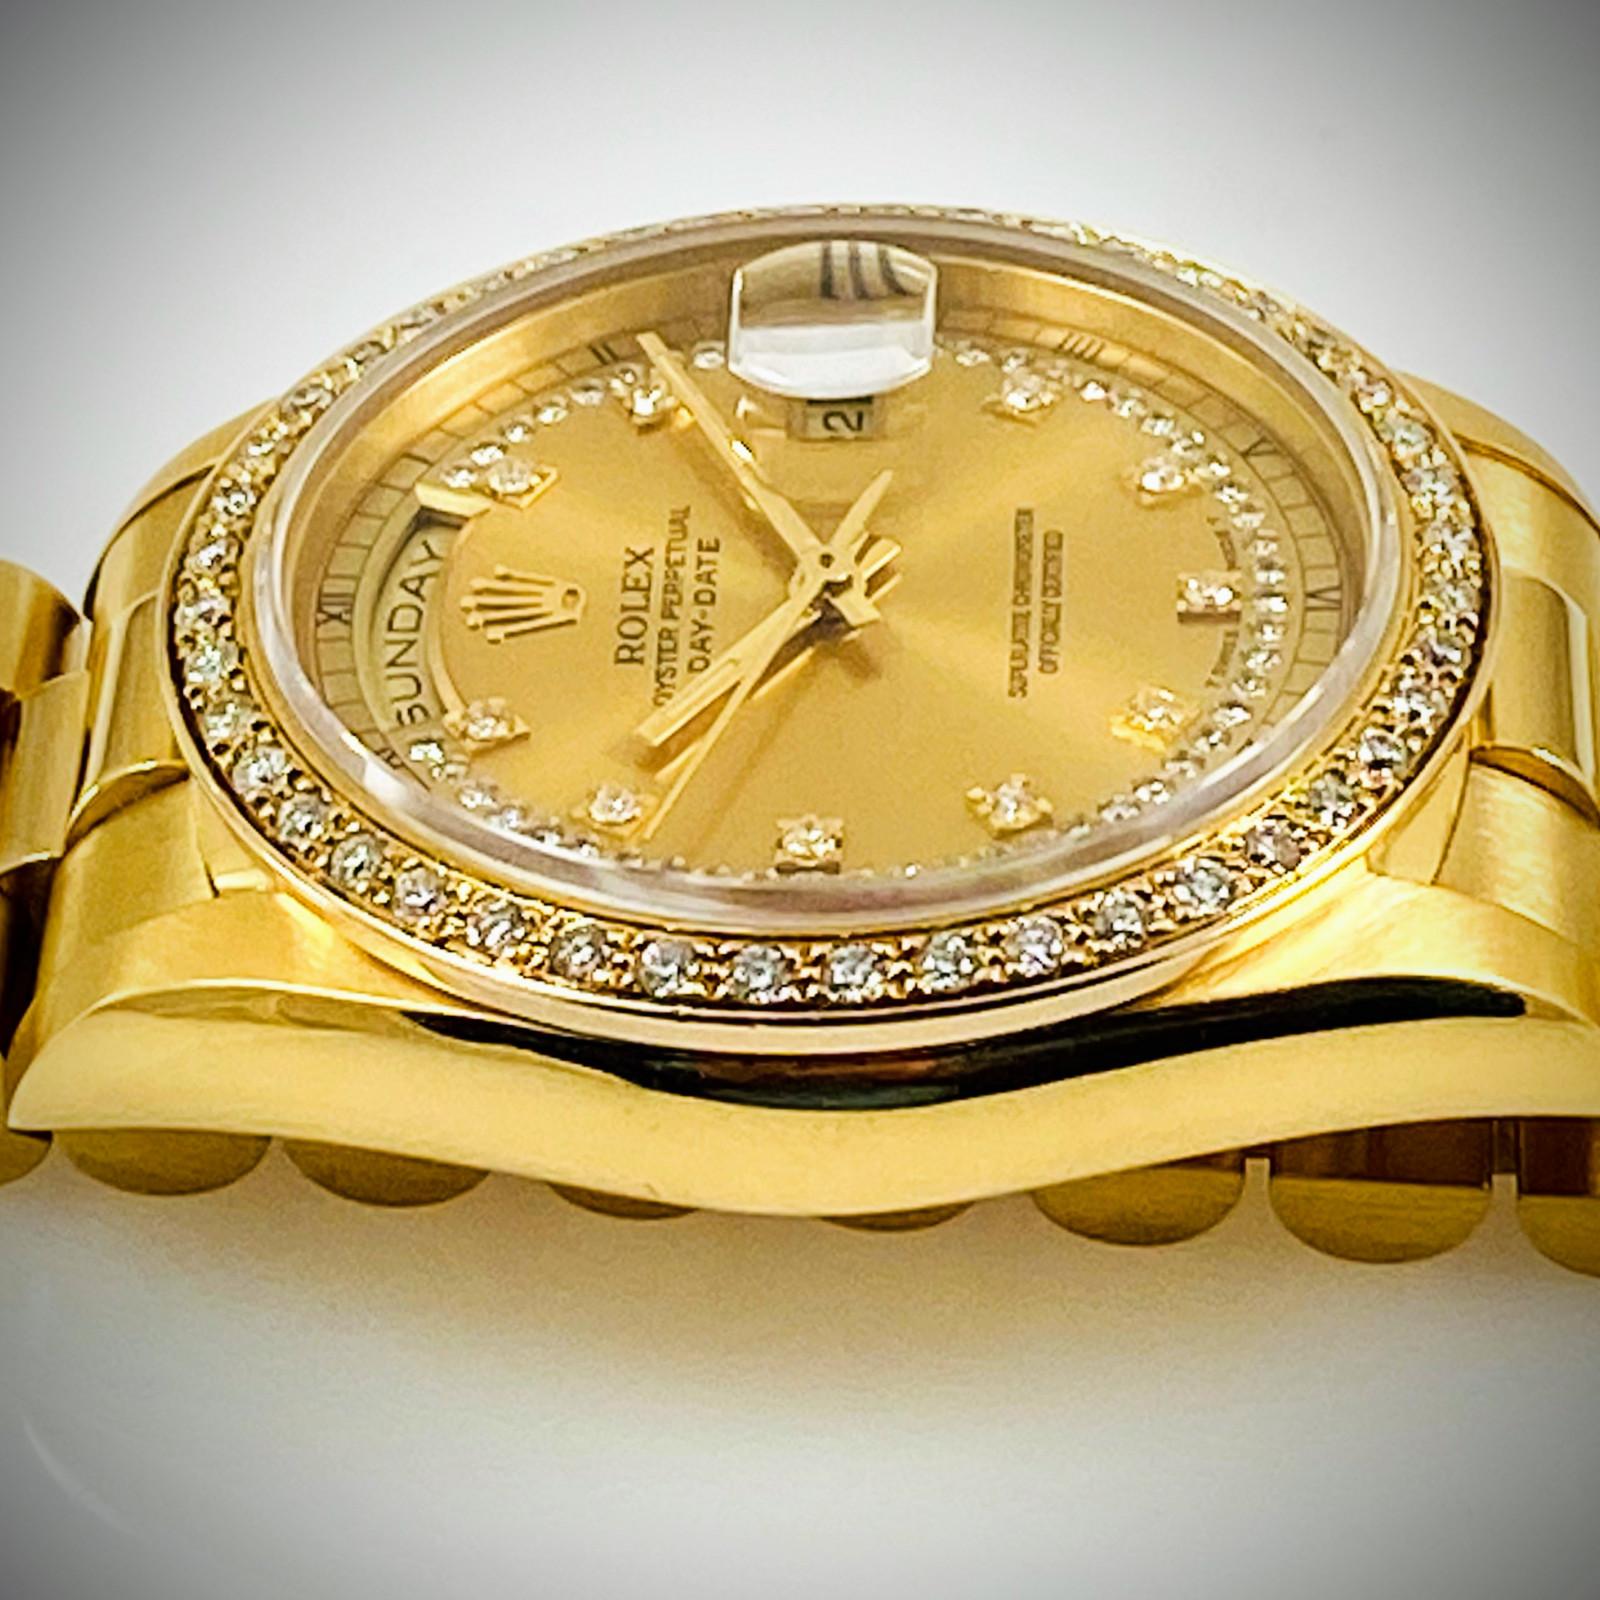 Rolex 18348 Factory Original Diamonds Mint Condition.